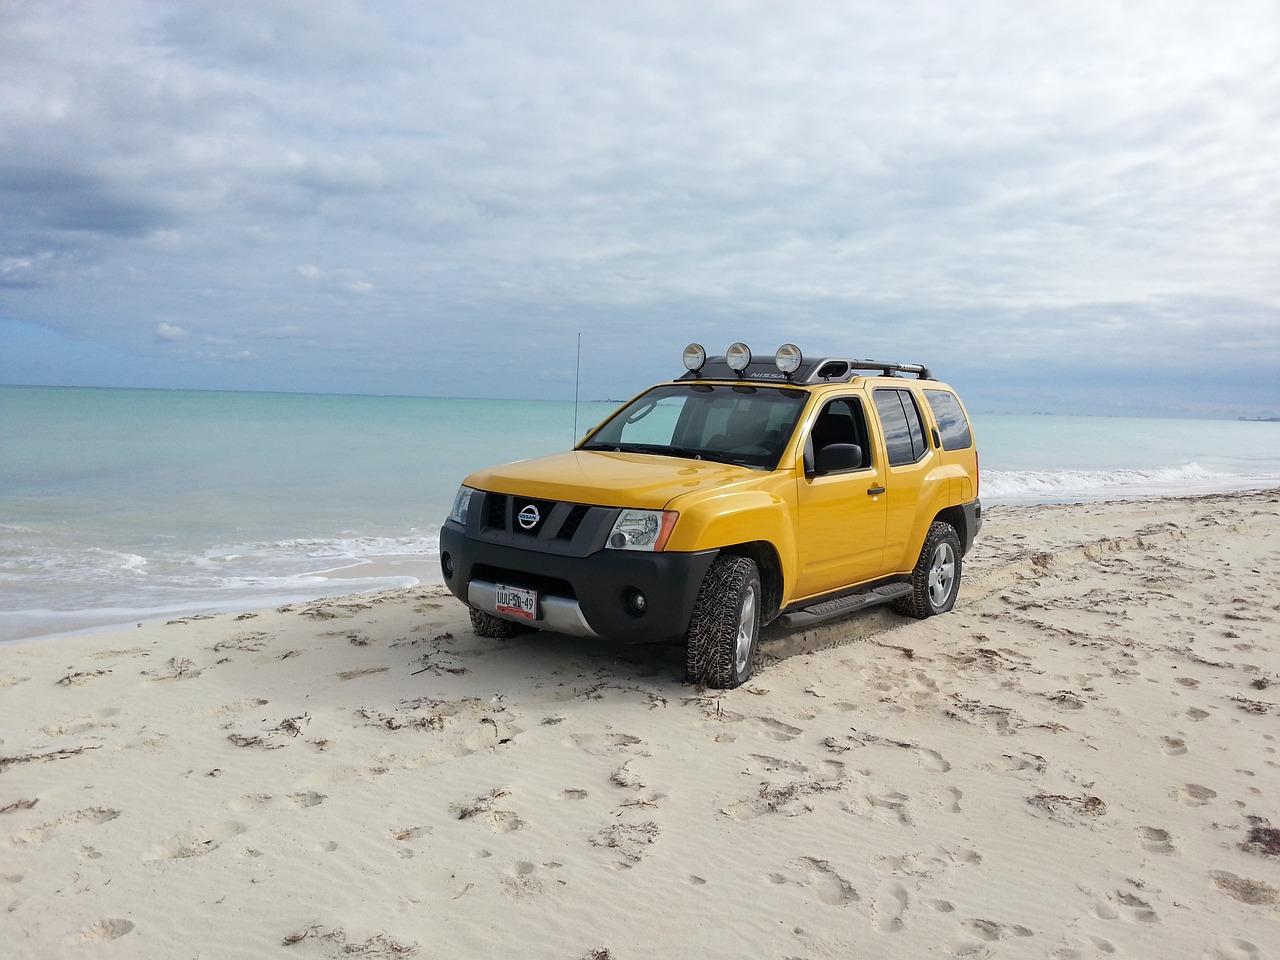 Yellow Xterra on the beach